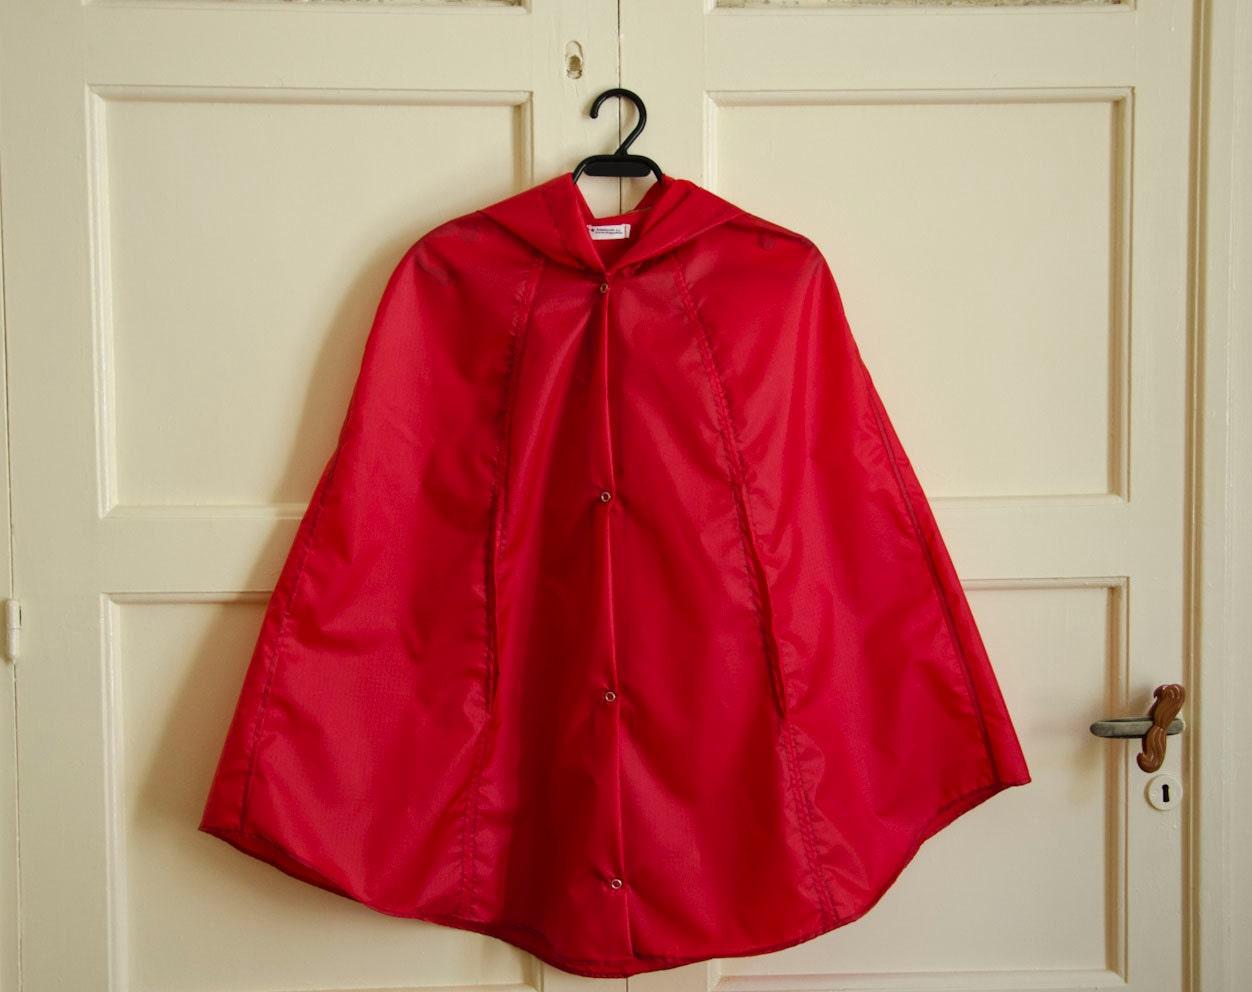 rote regencape vintage inspiriert cape mit von karmologyclinic. Black Bedroom Furniture Sets. Home Design Ideas